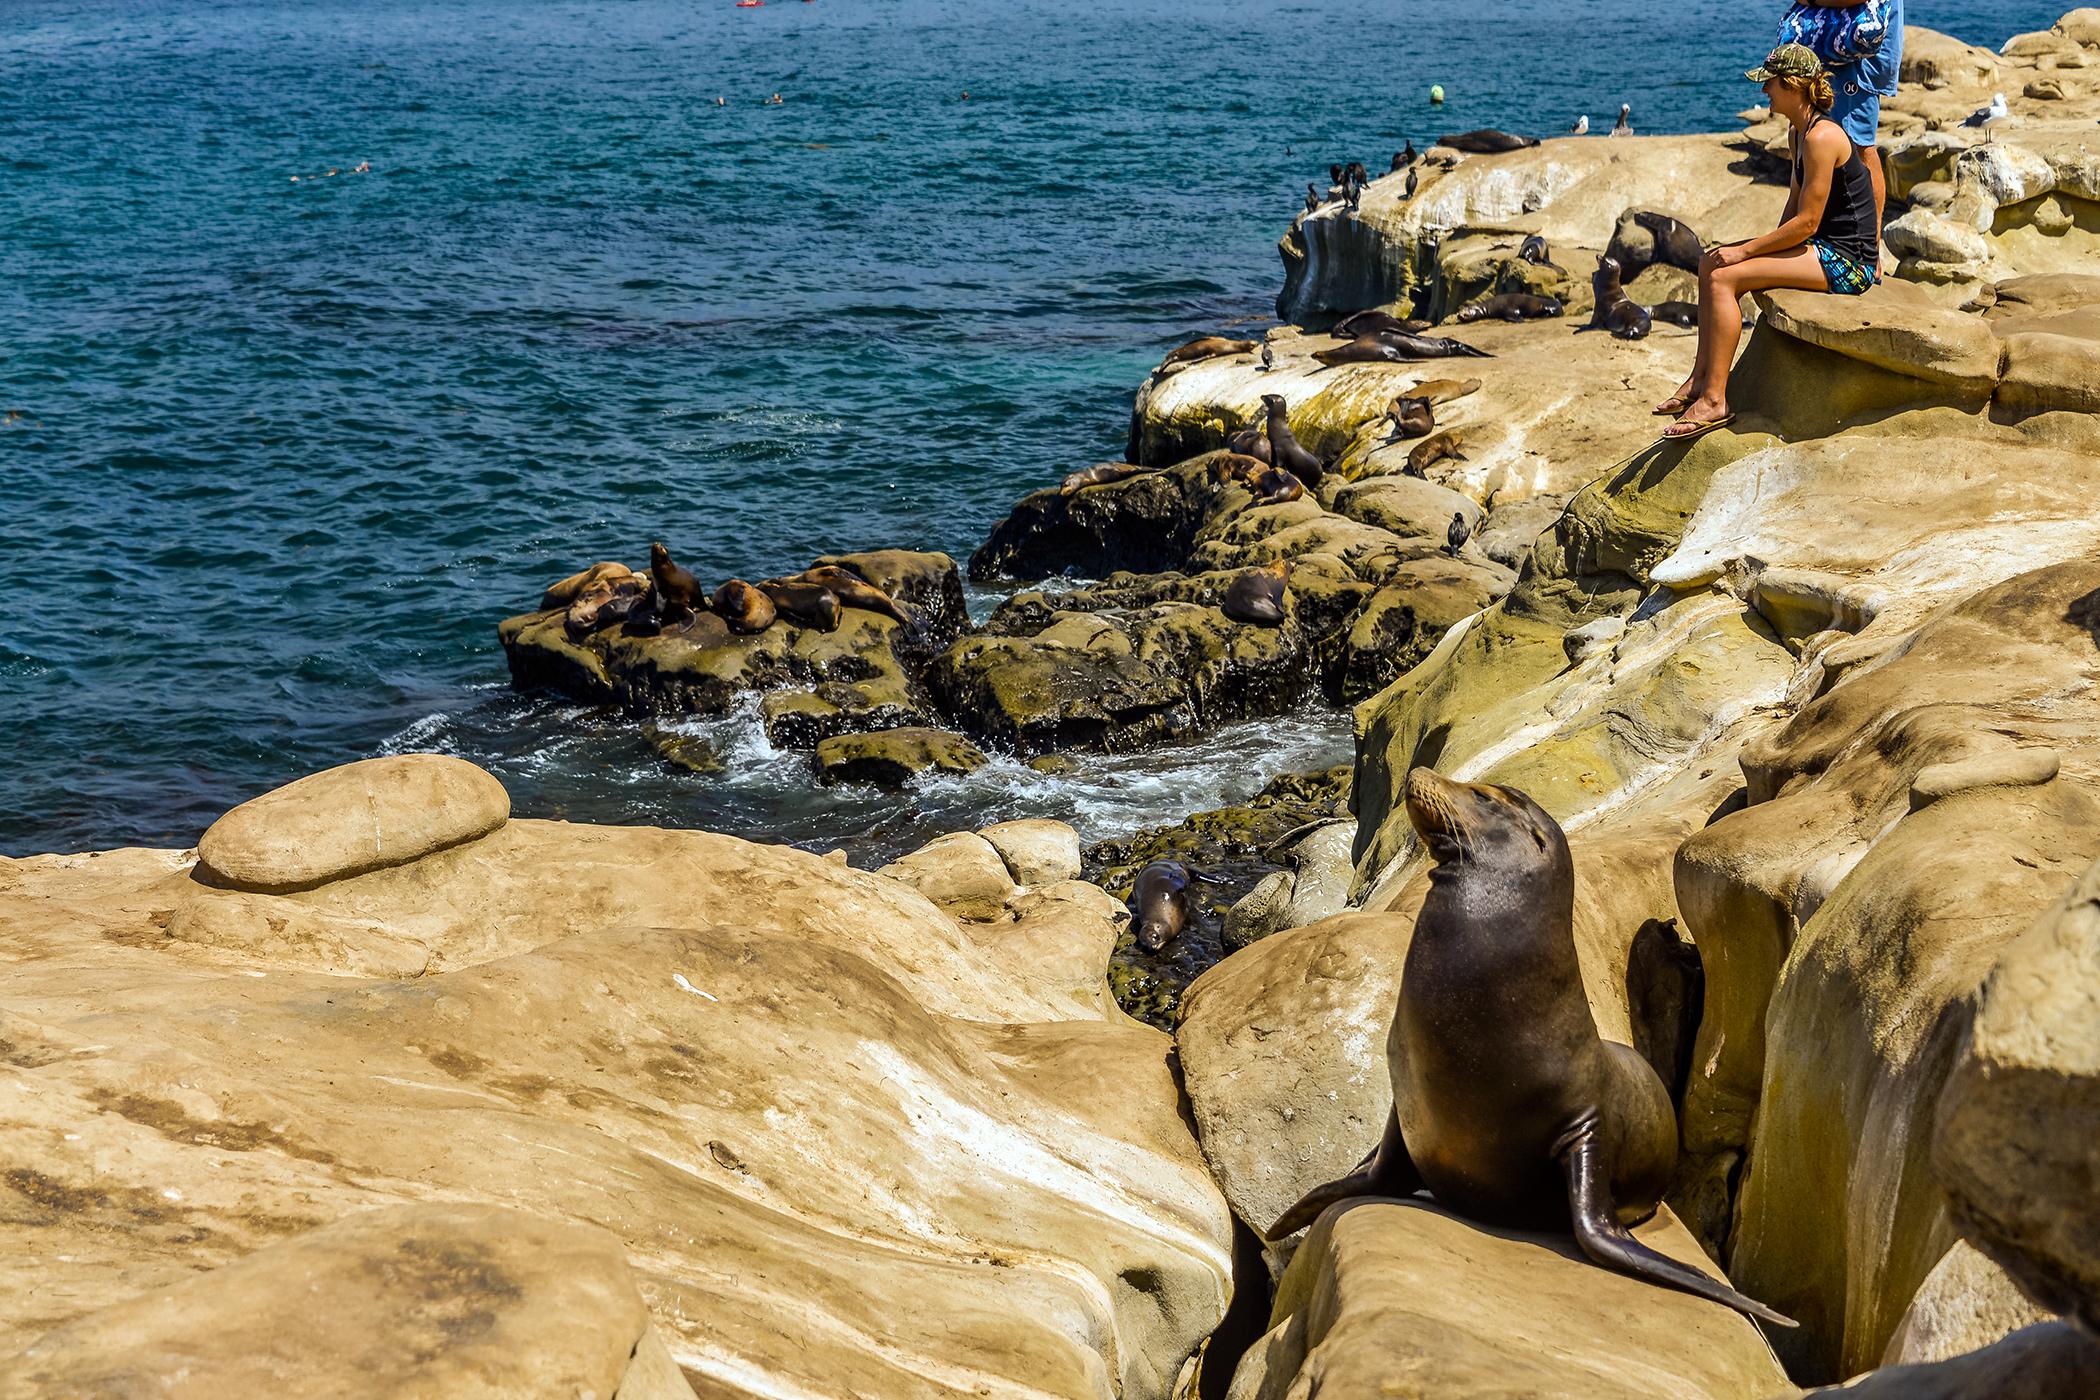 151028_COLL_BeachBums_UCSanDiego